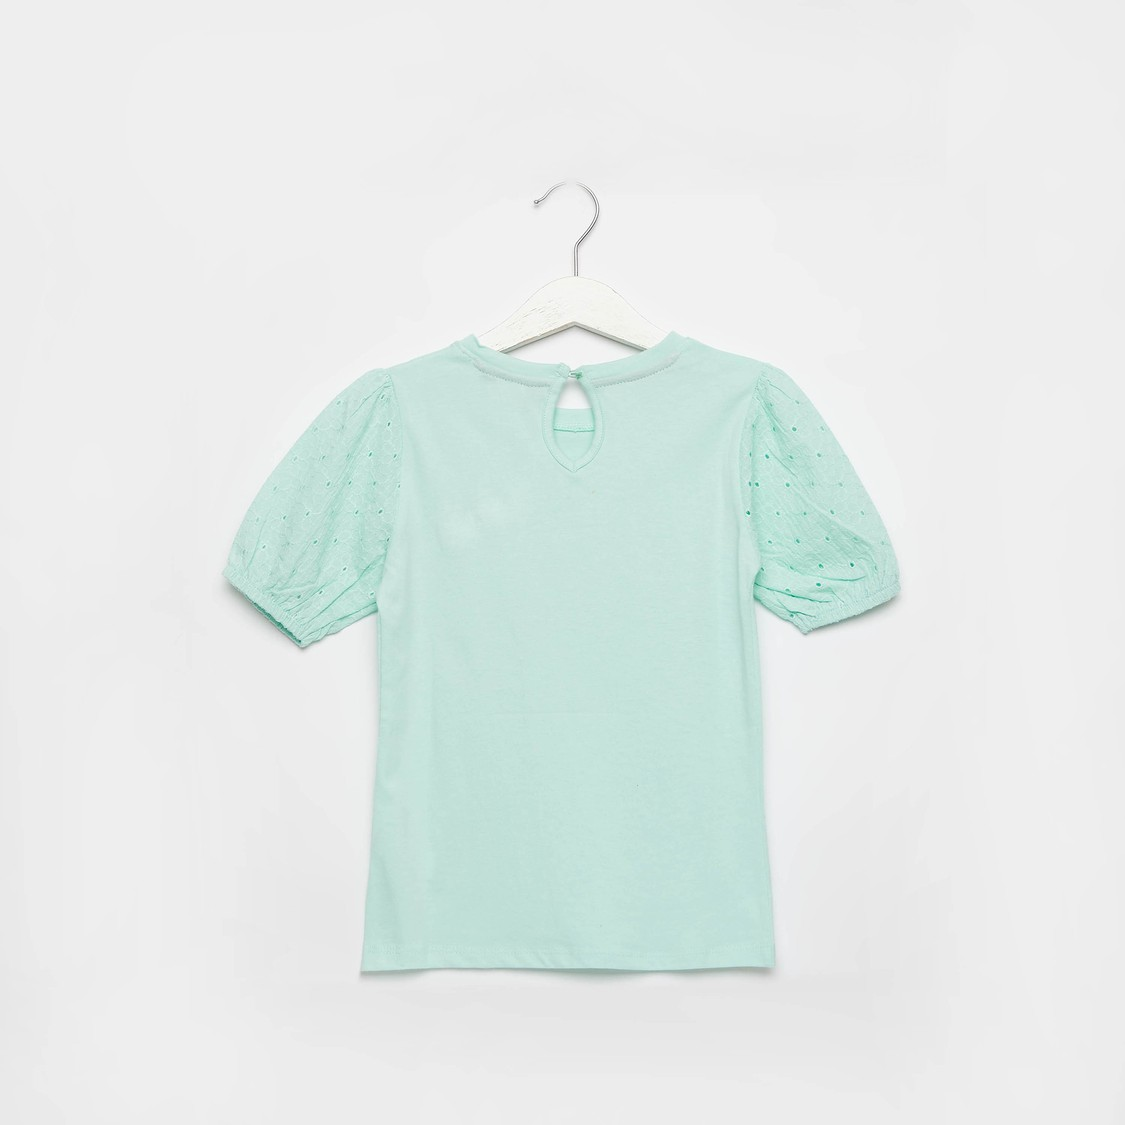 Embellished Round Neck T-shirt with Short Sleeves